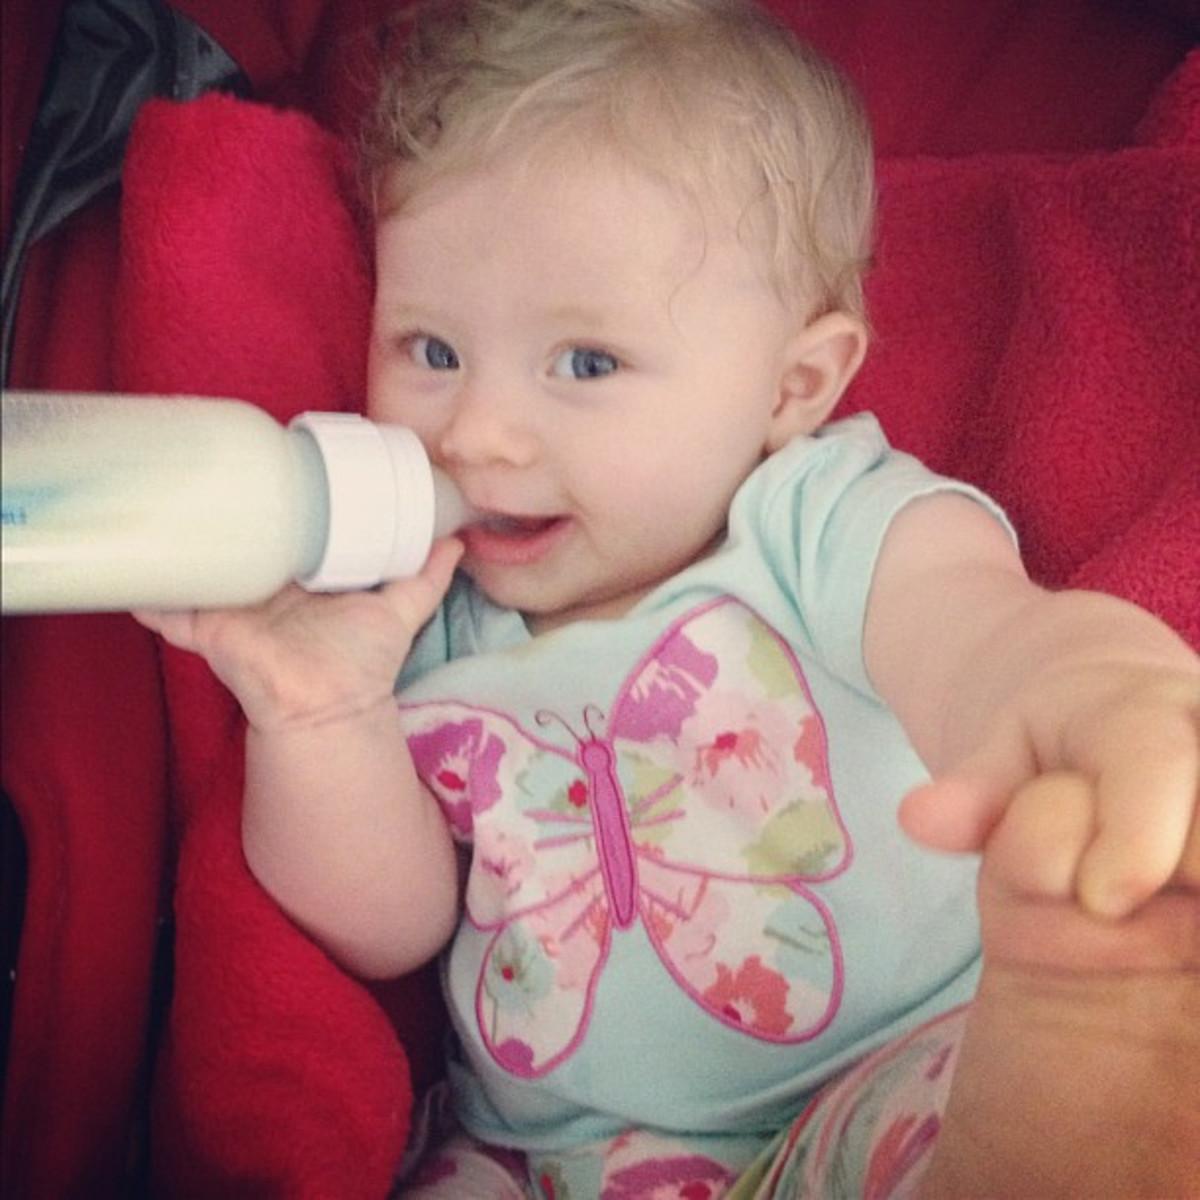 Alternatives to Baby Formula